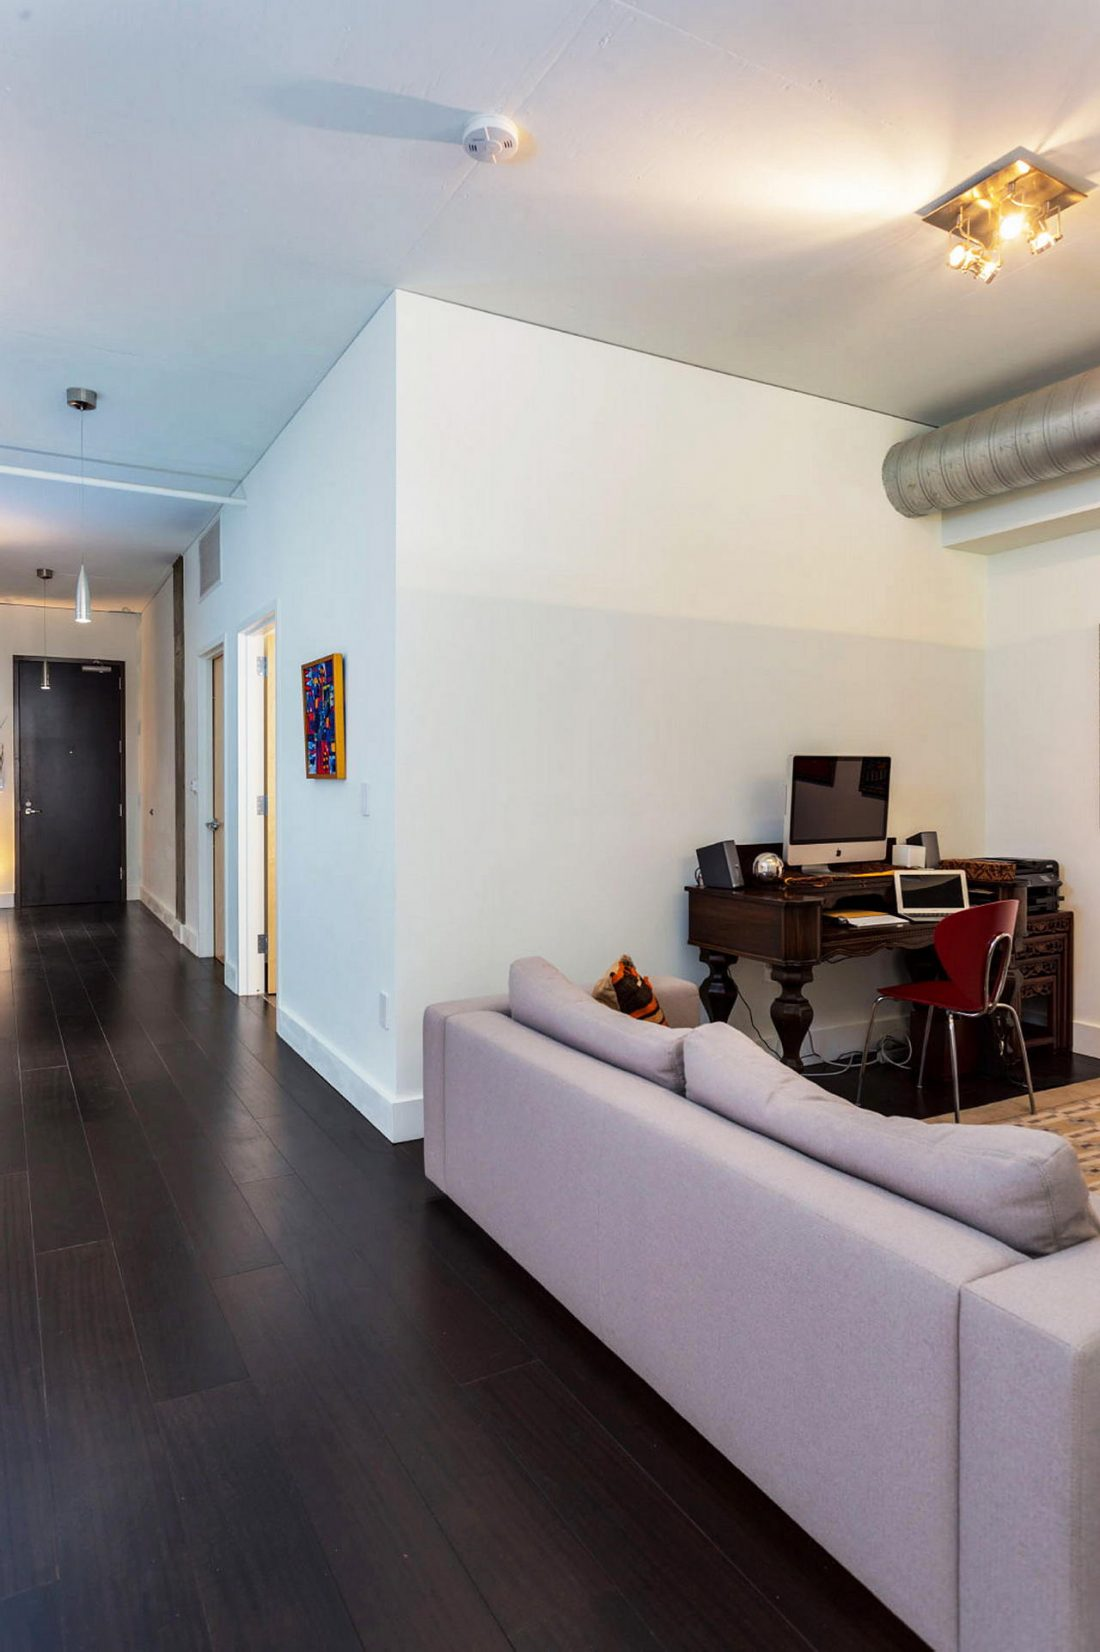 Дизайн интерьера квартиры в стиле лофт 62